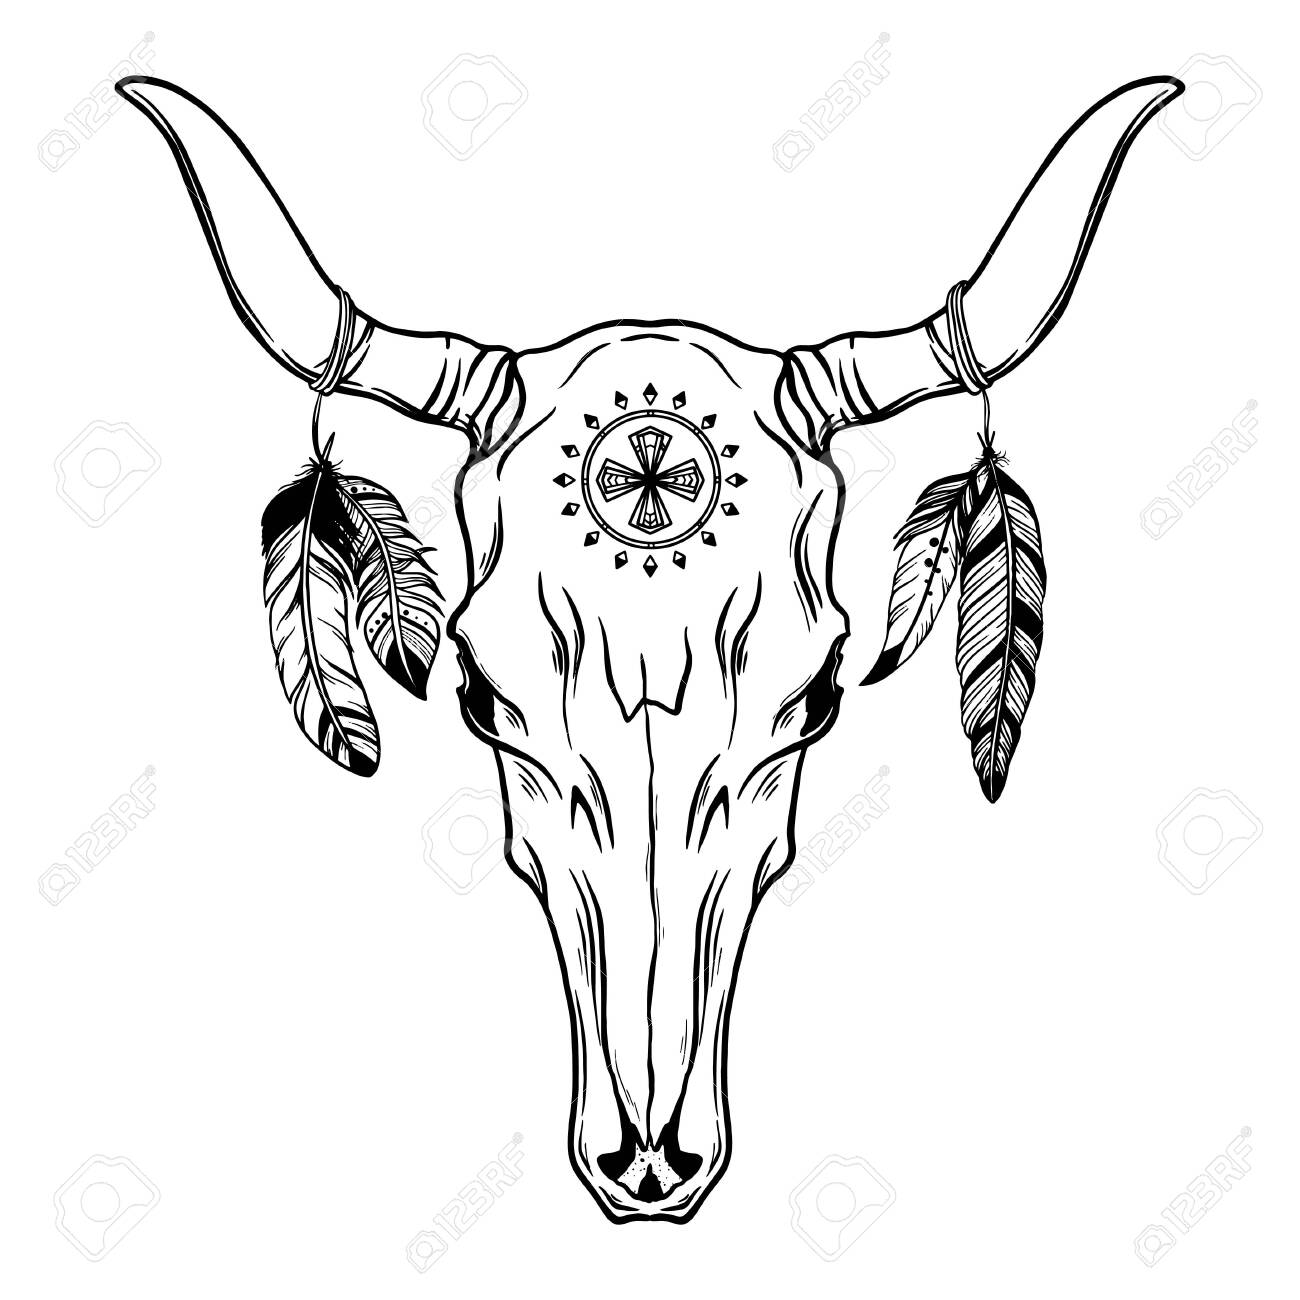 Hand drawn Buffalo Skull Native American Totem - 132919737